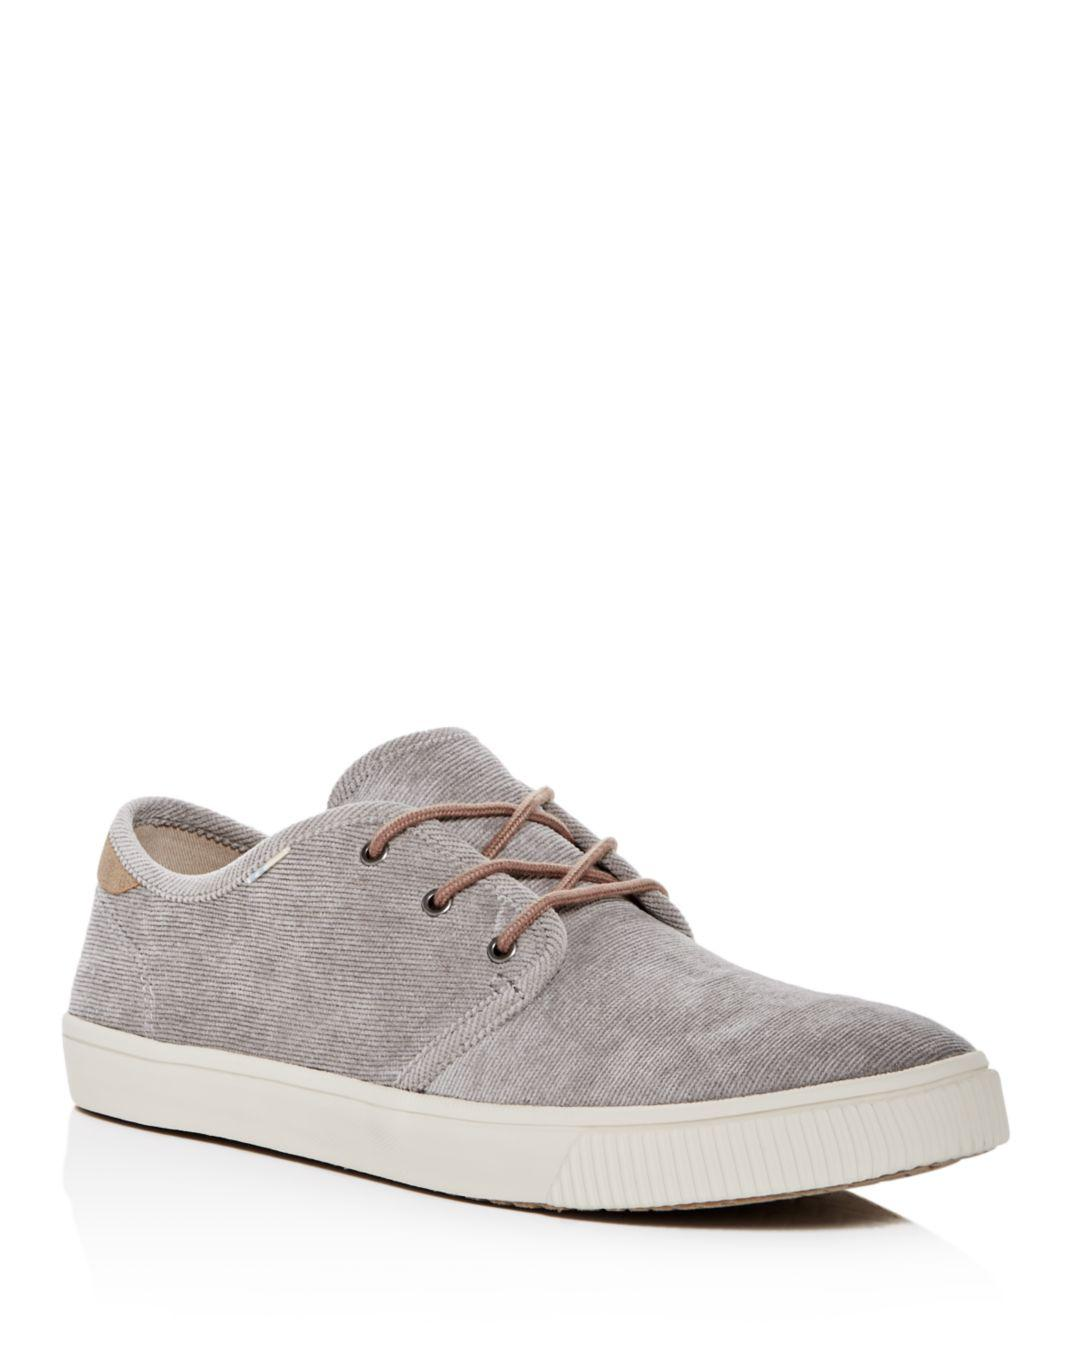 1426f61e1f Lyst - TOMS Cement Micro Corduroy Men s Carlo Sneakers Topanga ...